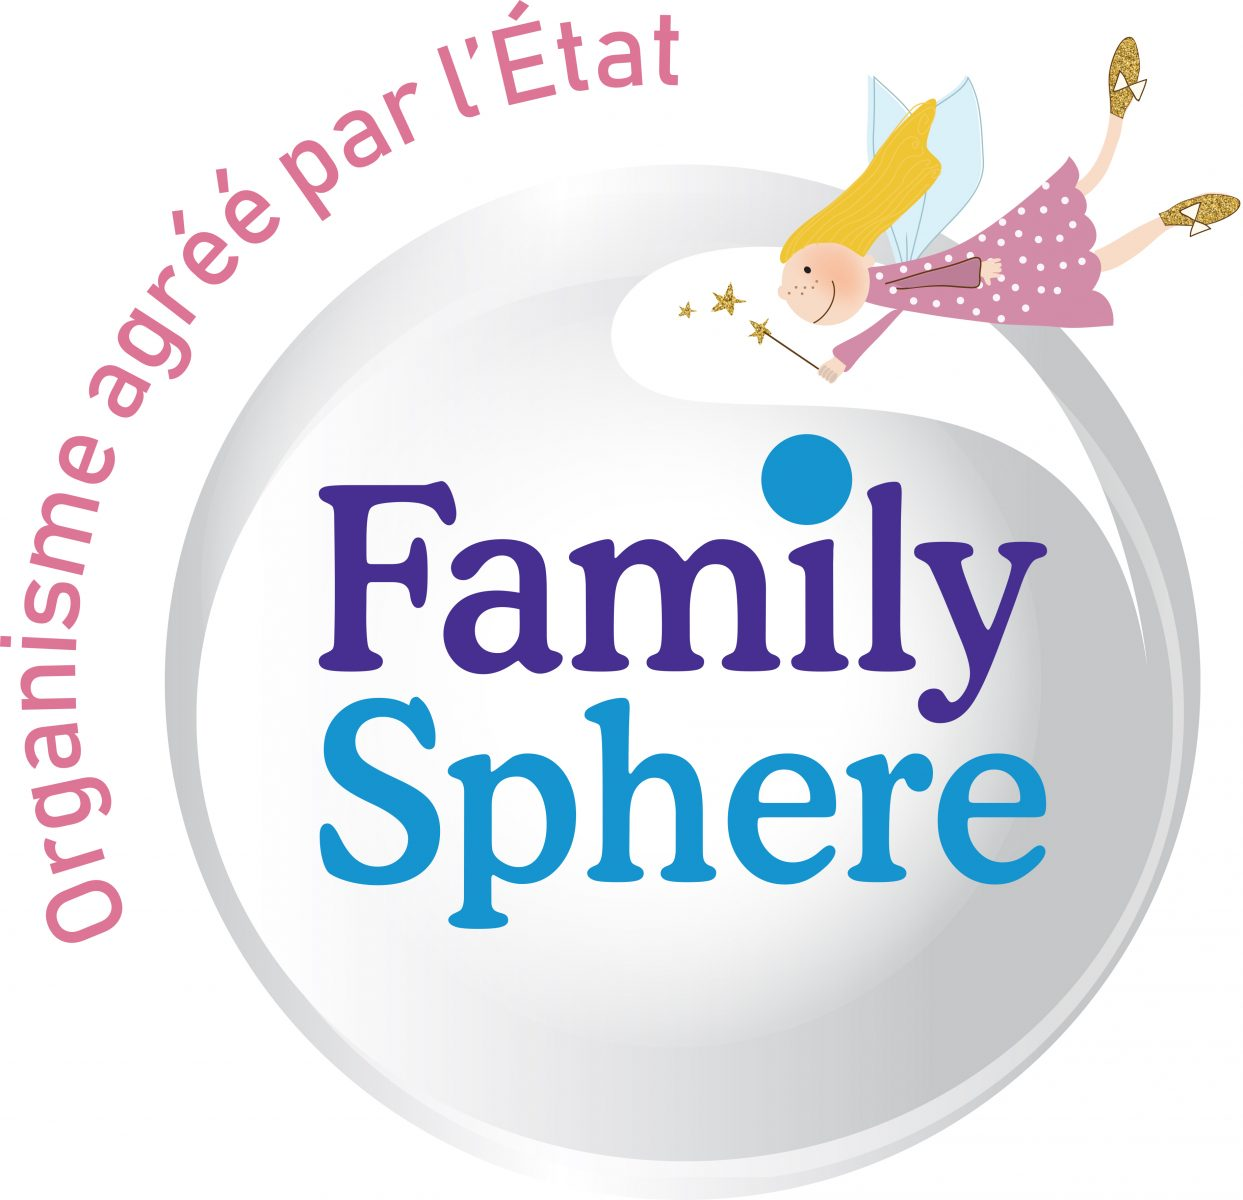 Family Sphere vient d'ouvrir une agence à Sens. Stéphanie Thourigny y accueille […]